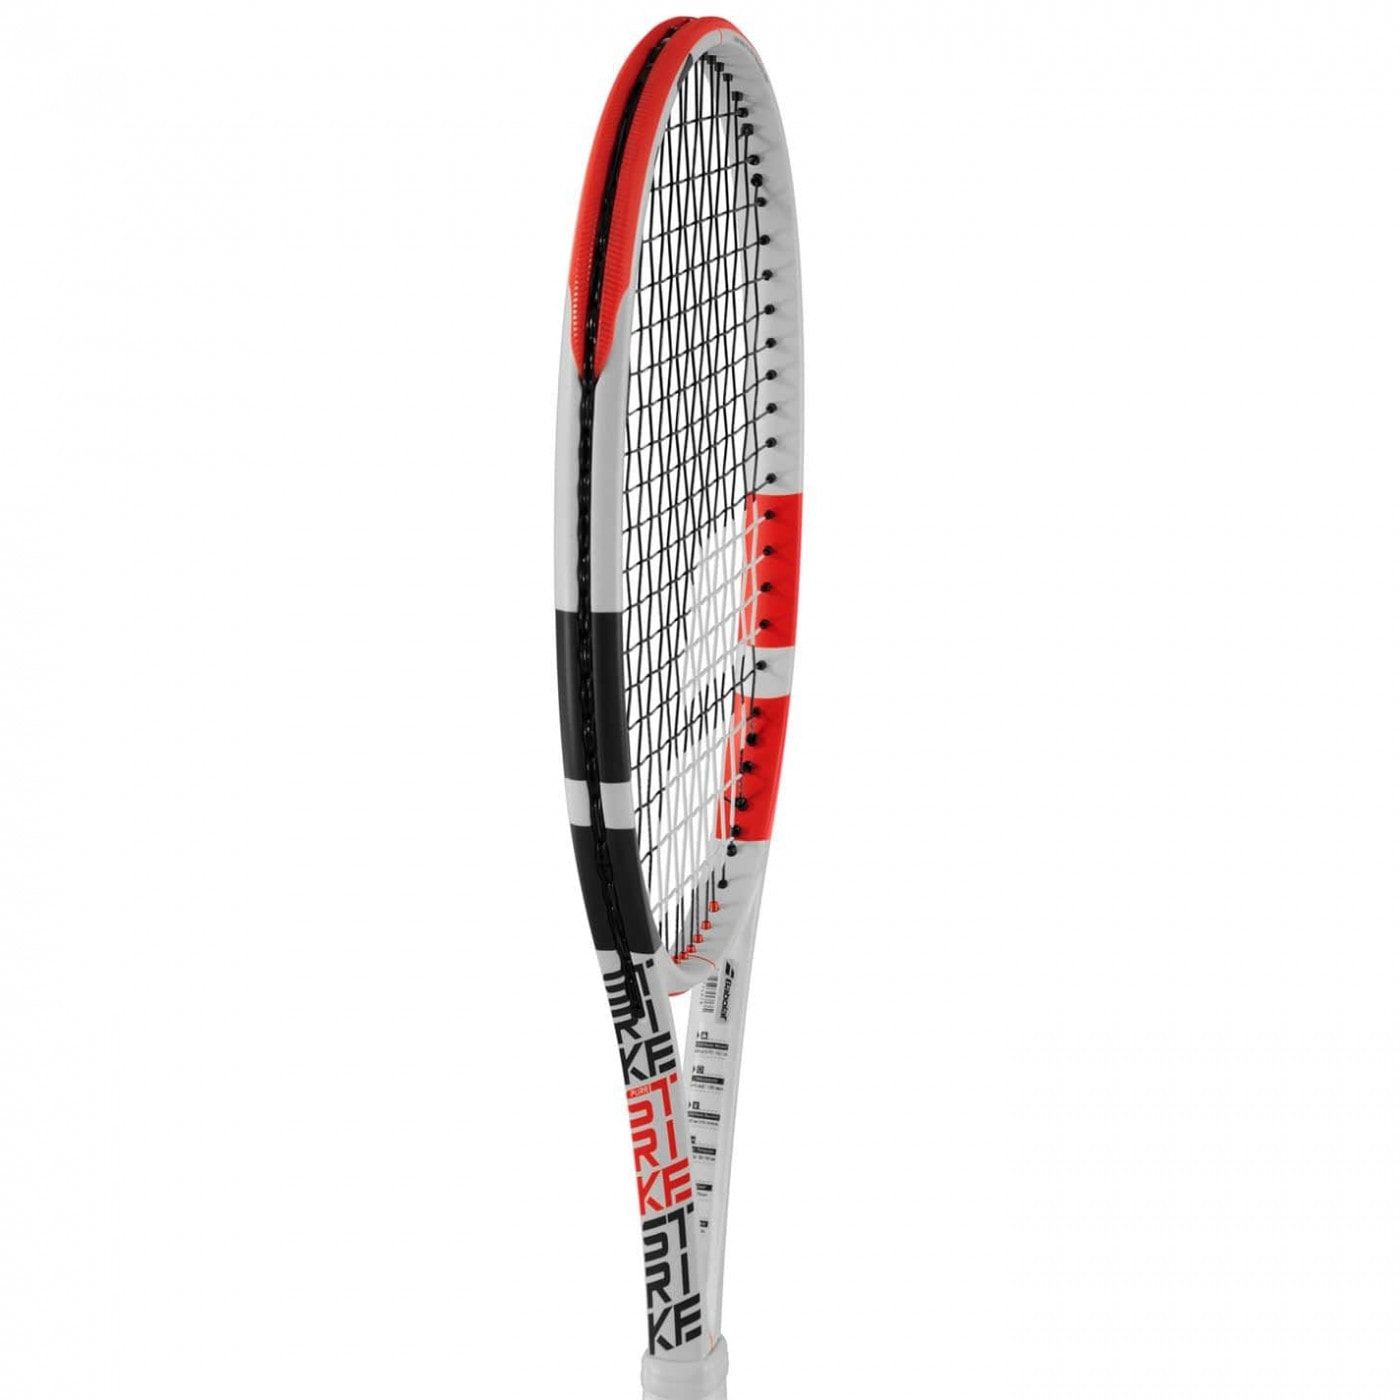 Babolat PStrike Team Tennis Racket